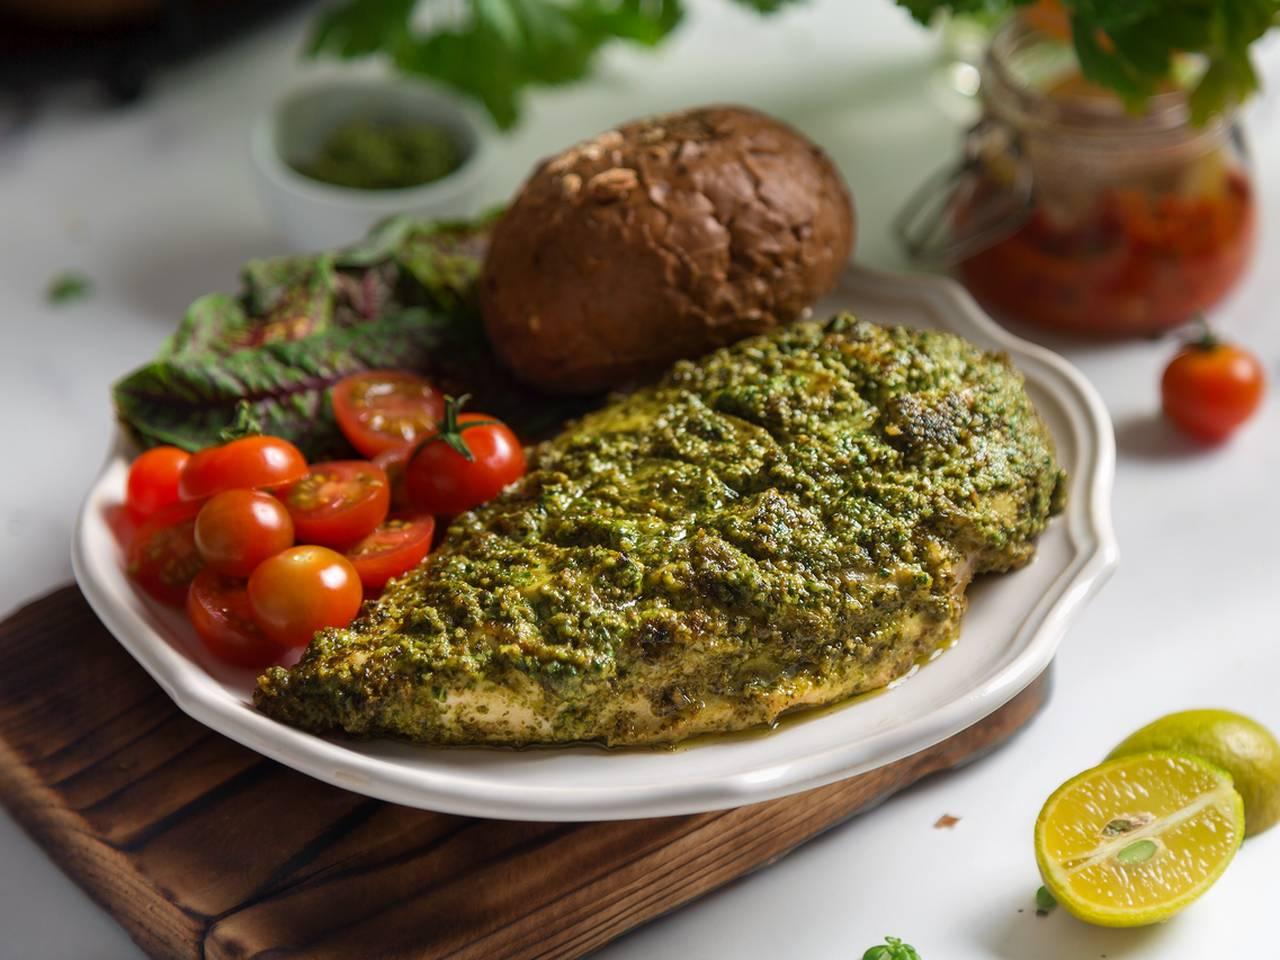 Easy Oven Baked Pesto Chicken Recipe